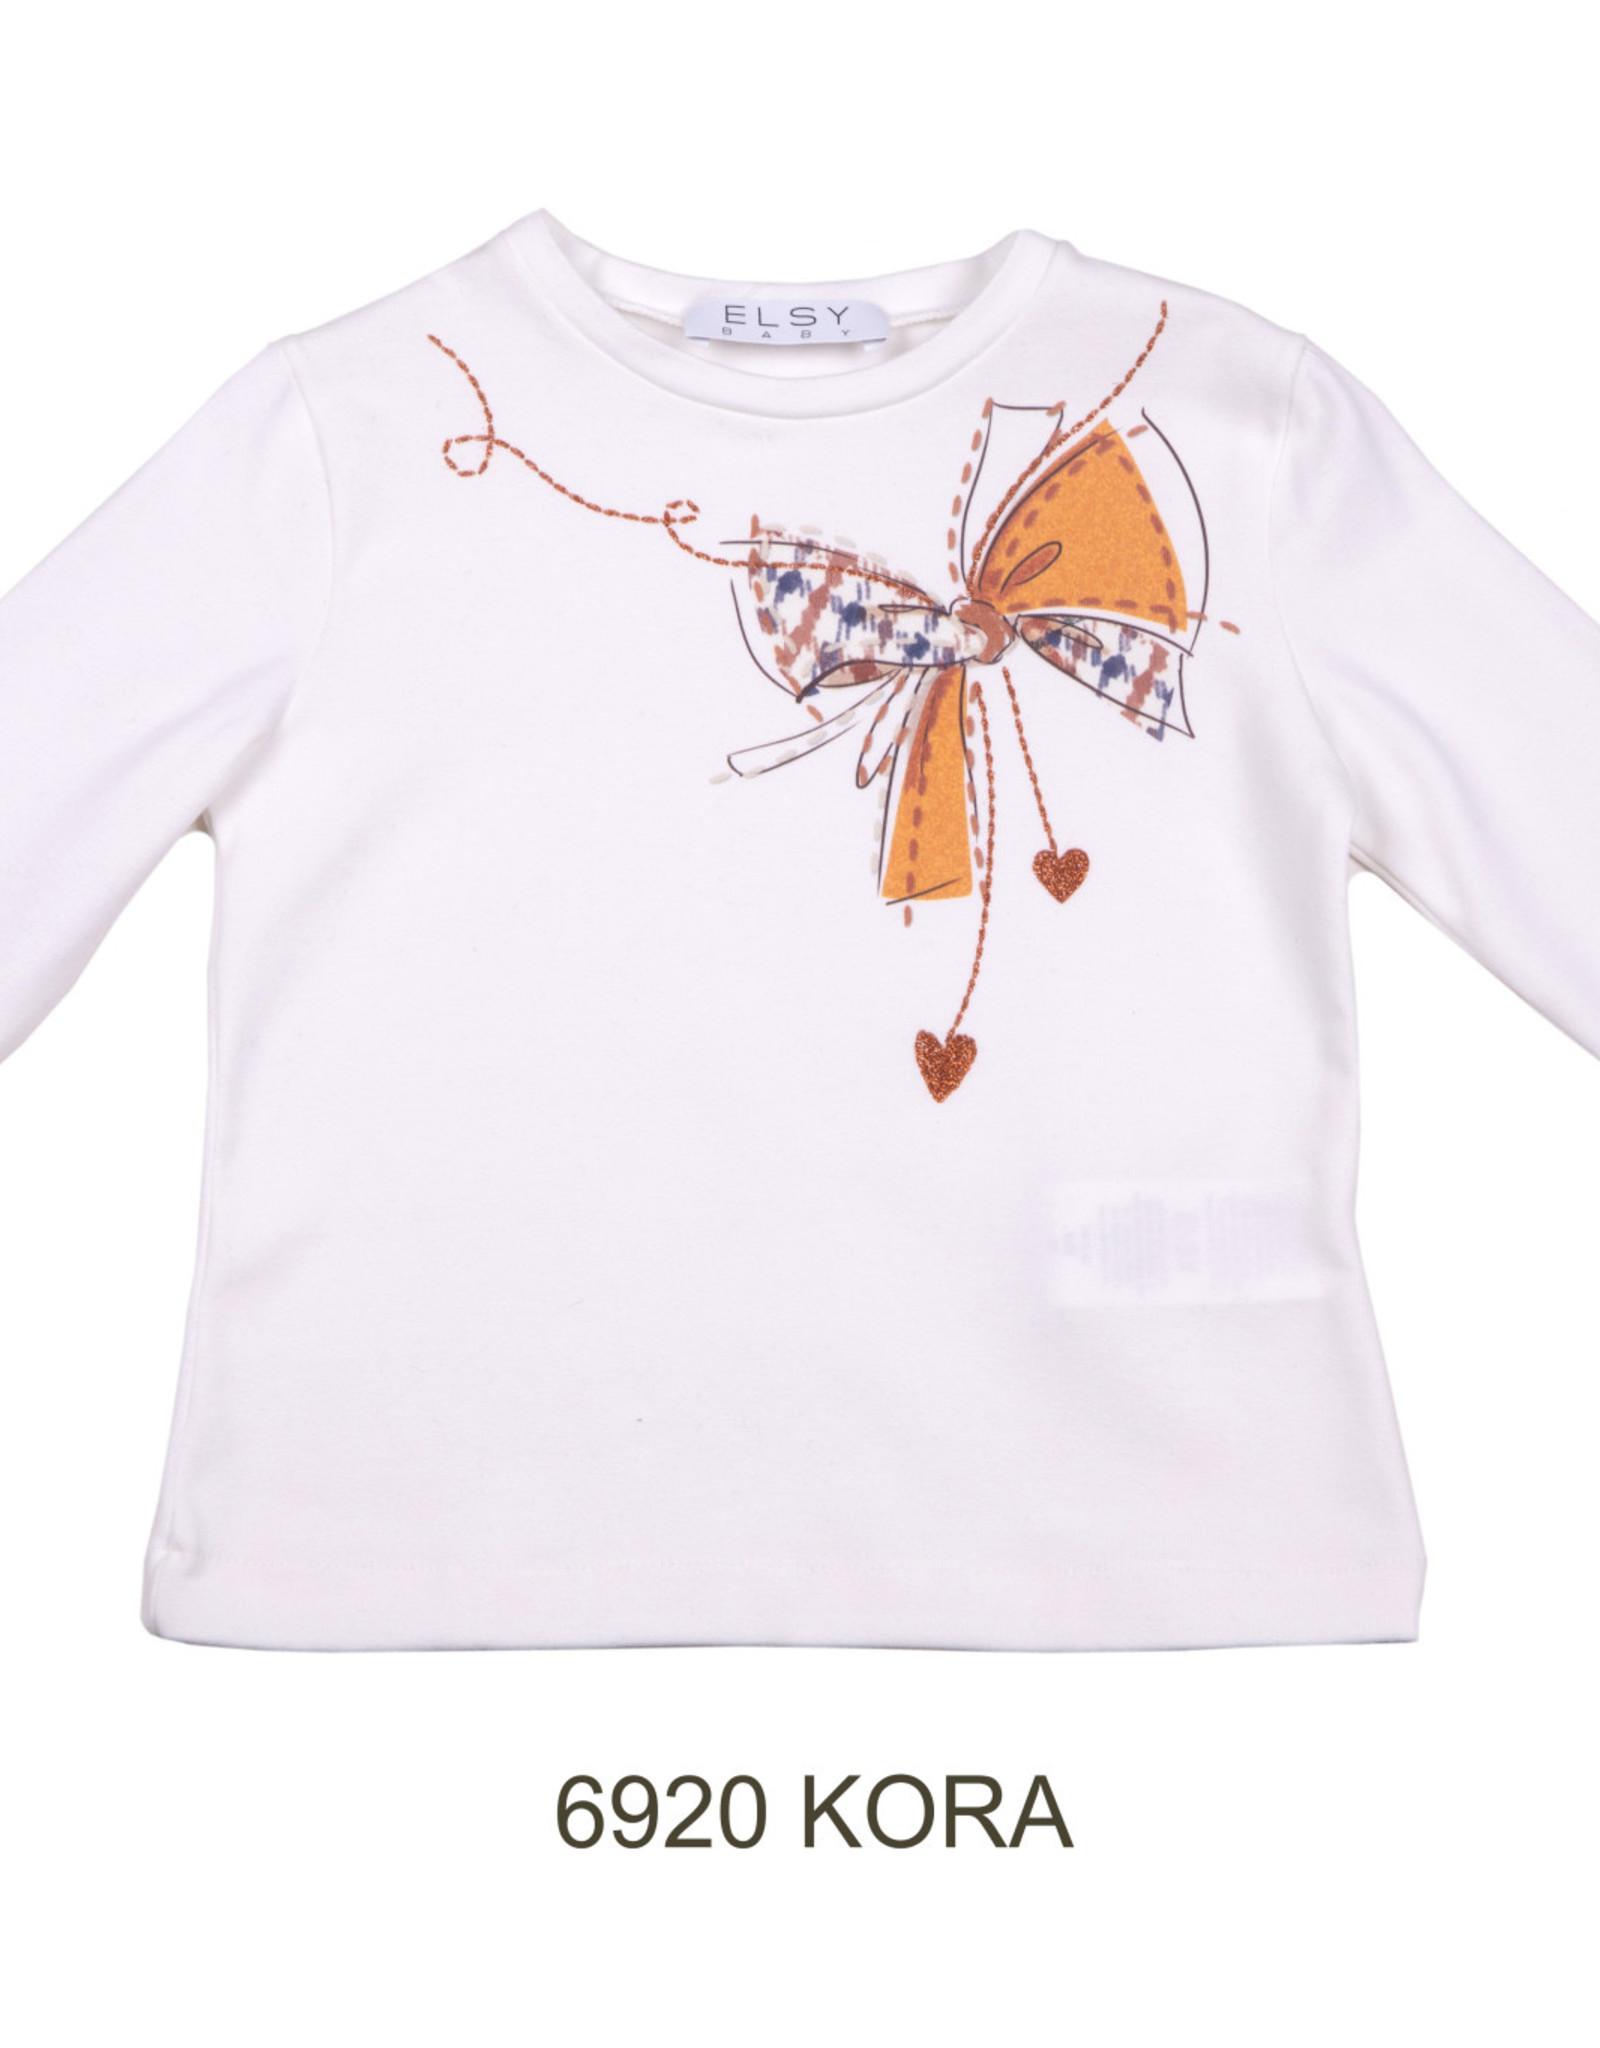 ELSY Kora T-Shirt Jersey Yogurt